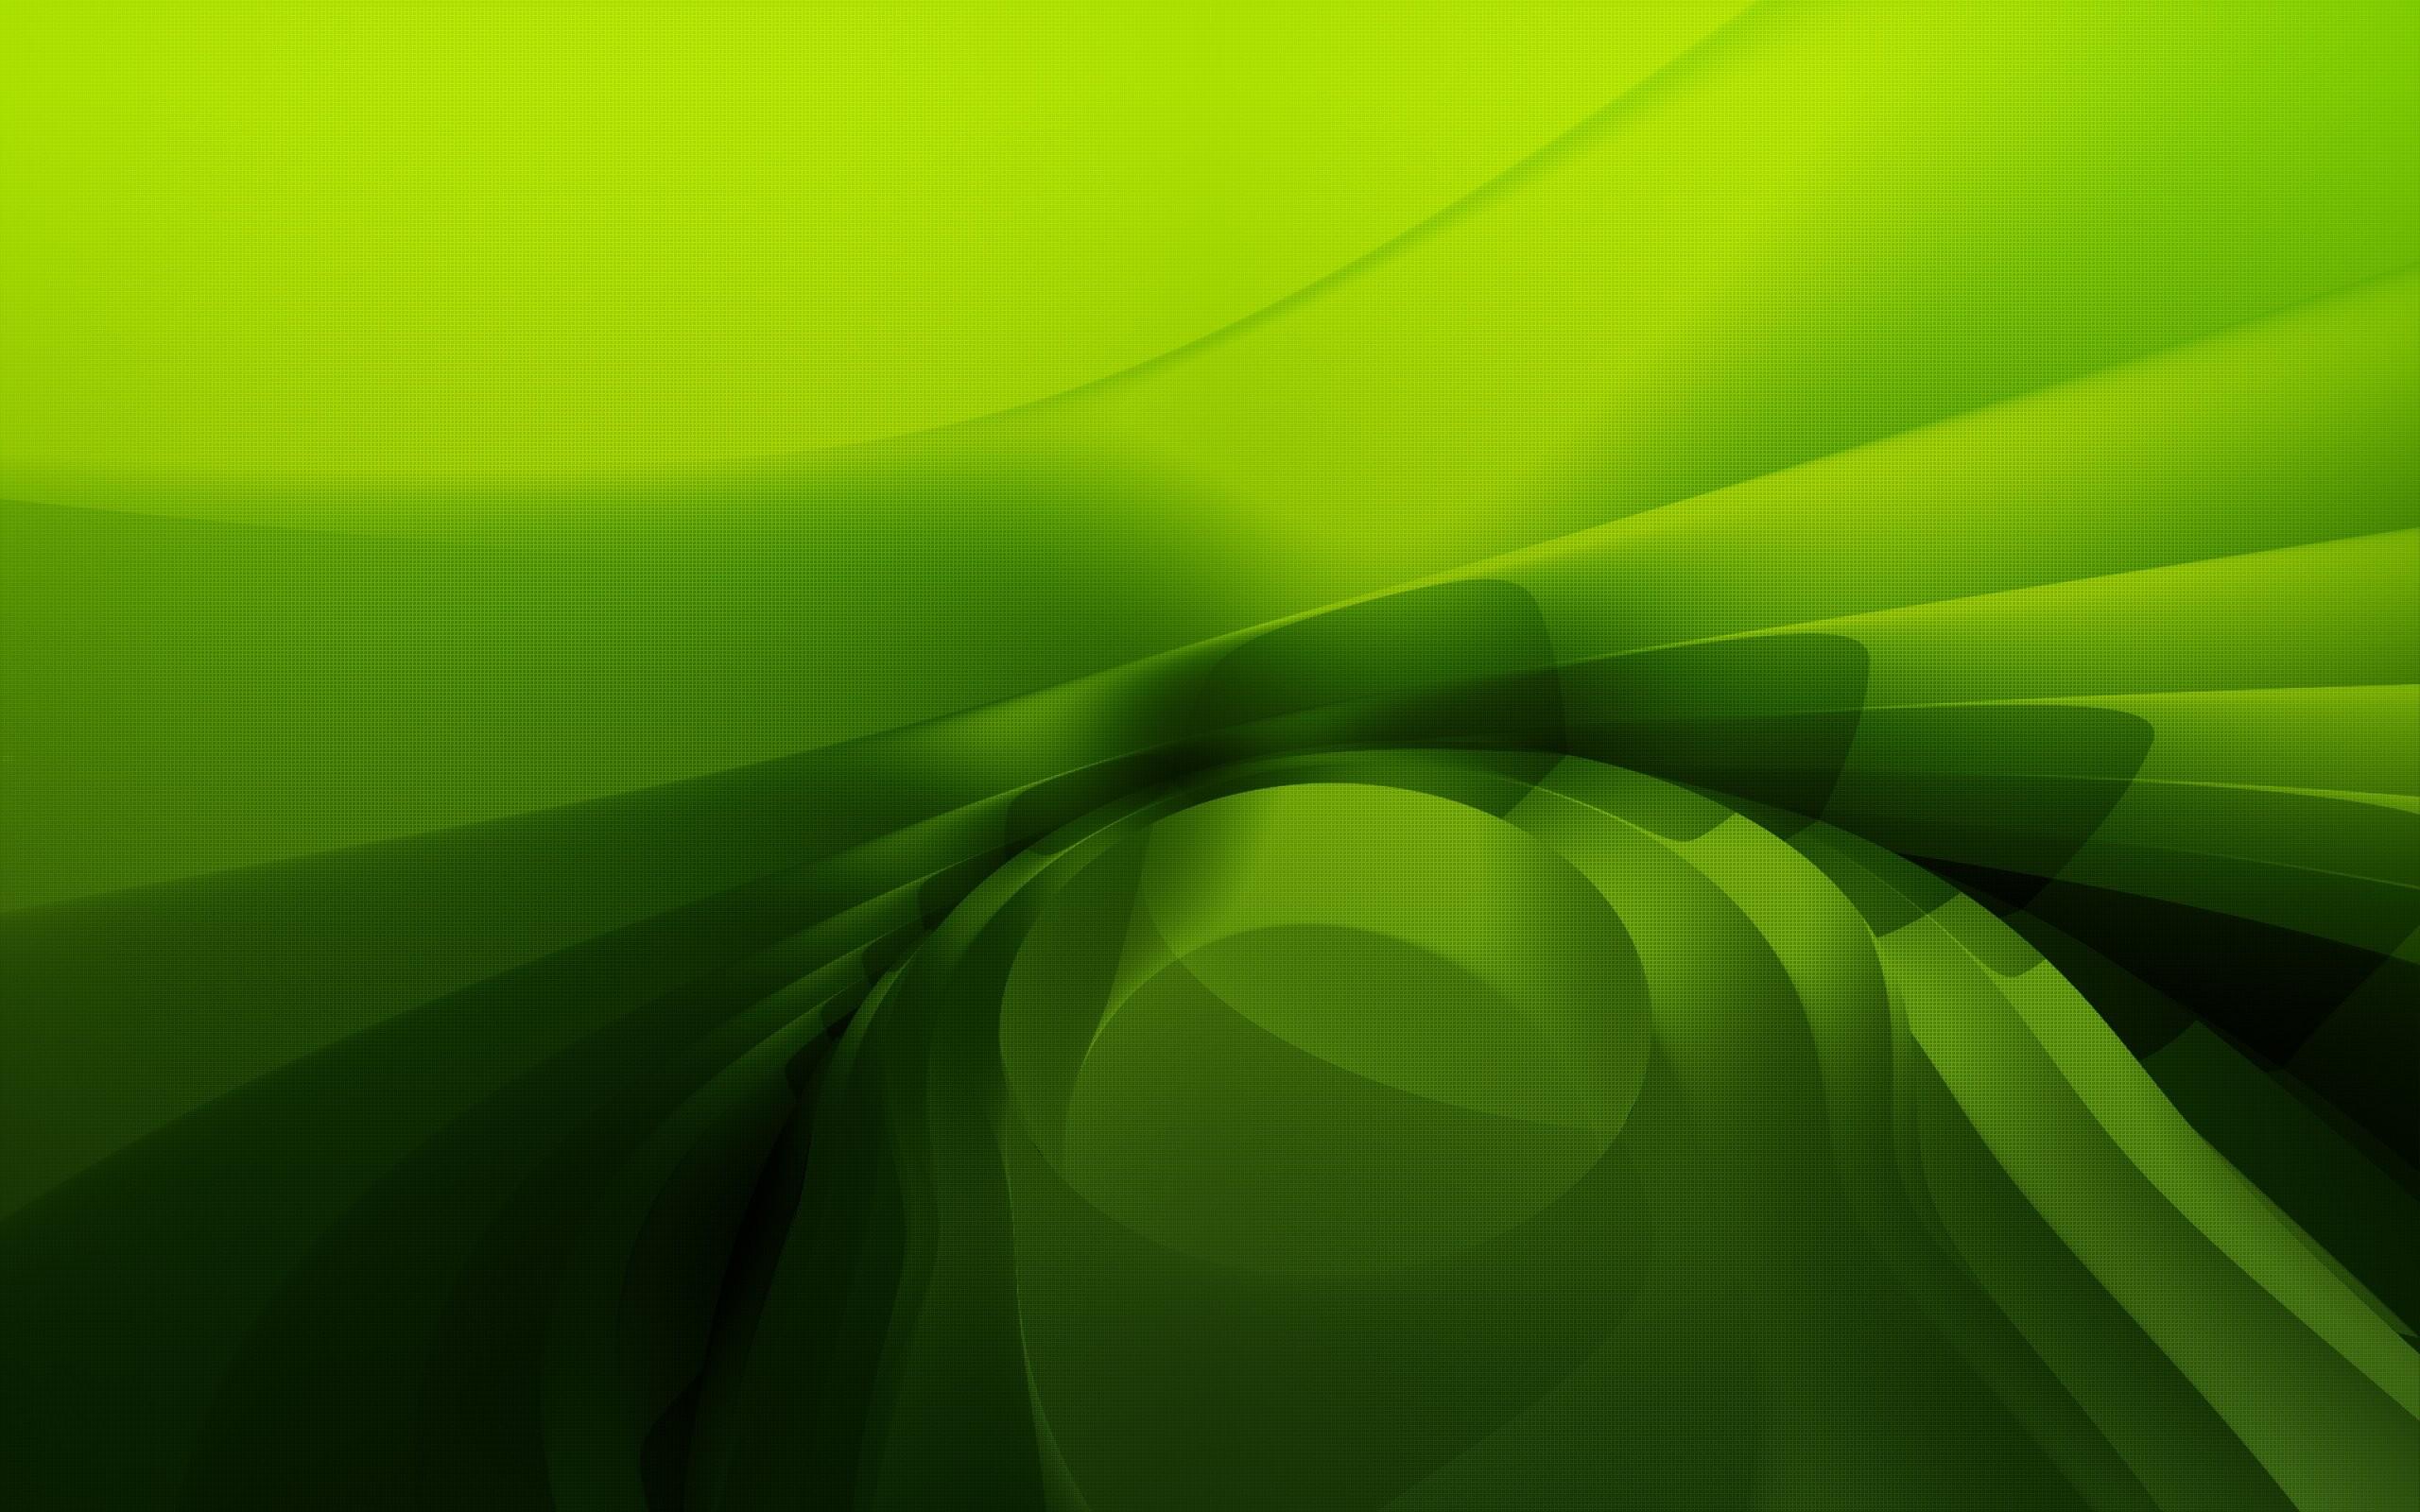 cool green wallpaper 1920×1080 – photo #10